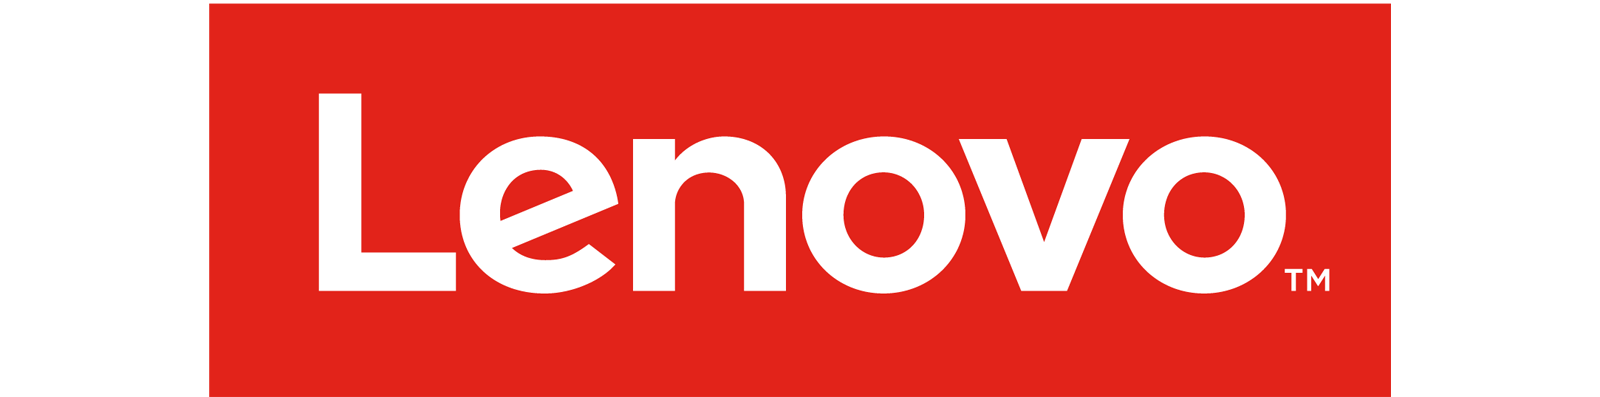 LenovoLogo-POS-Red-2.png